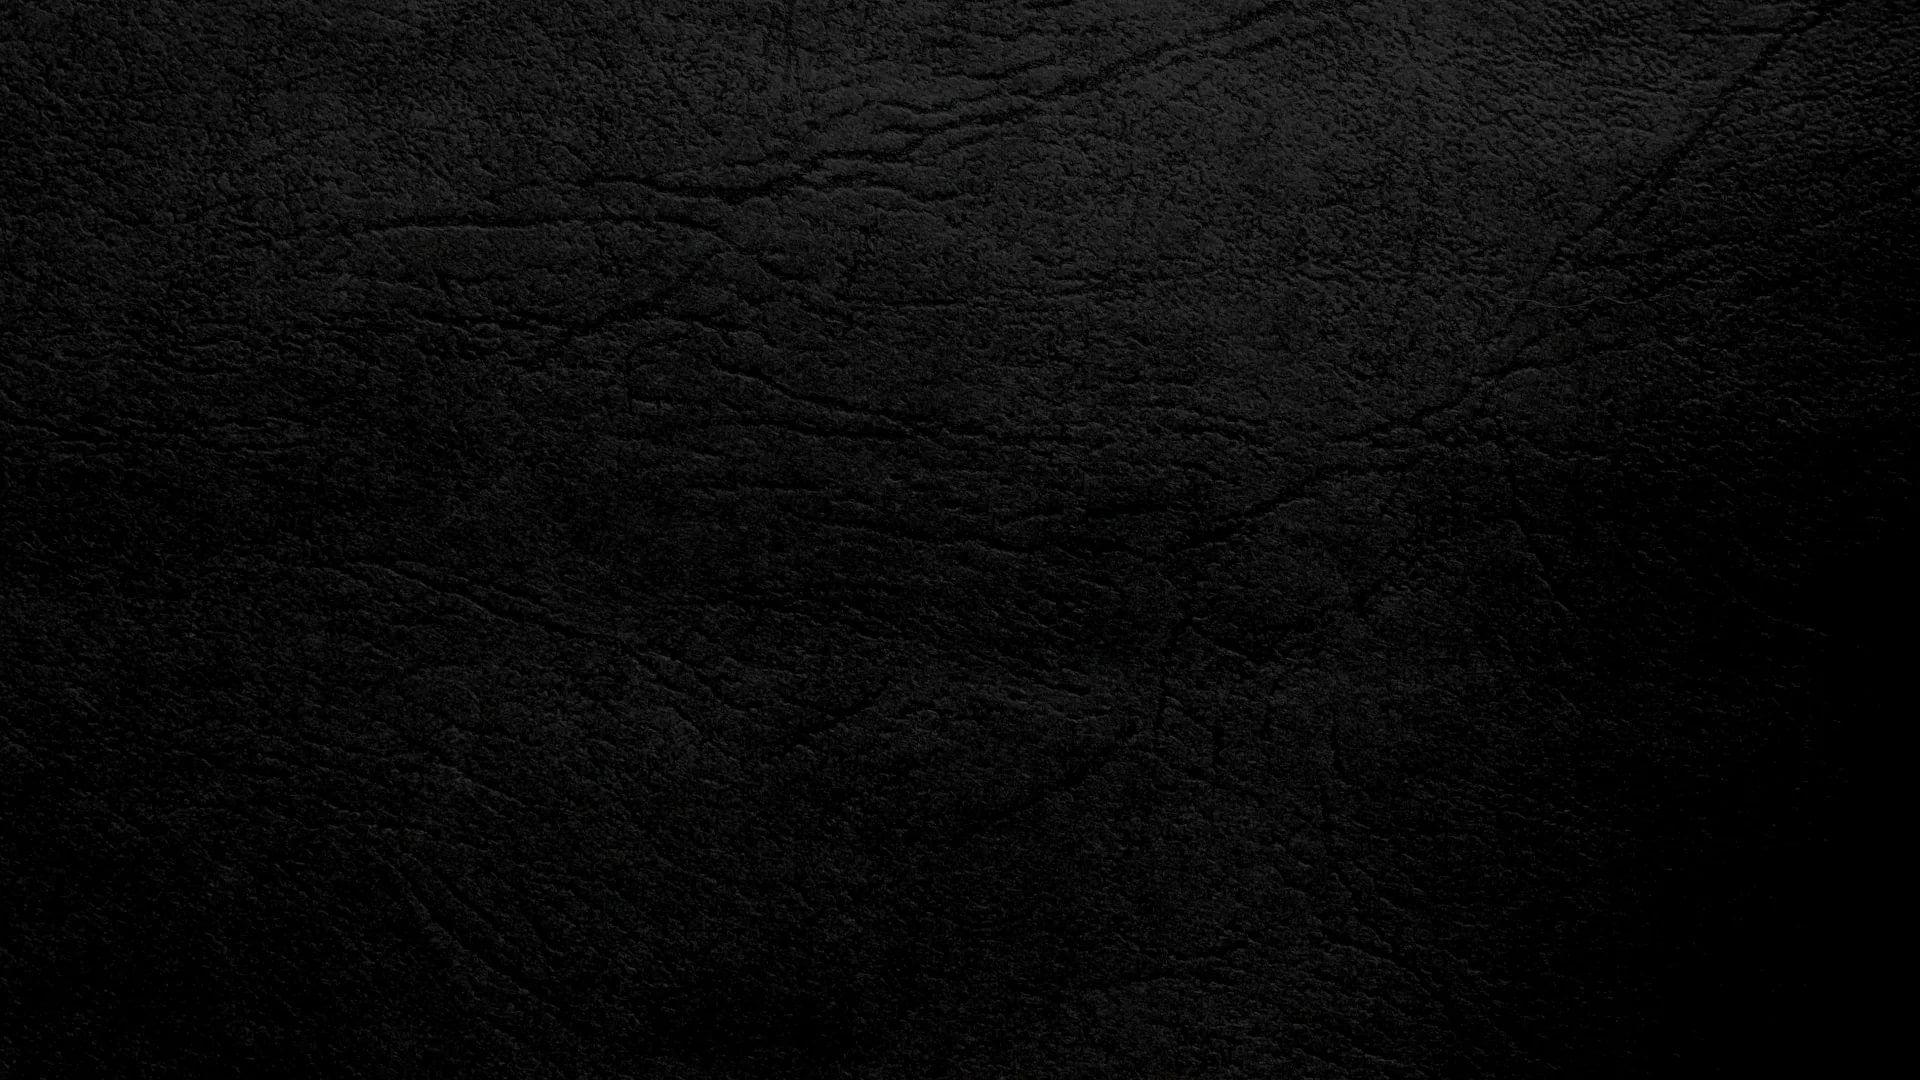 Plain Black hd wallpaper for laptop